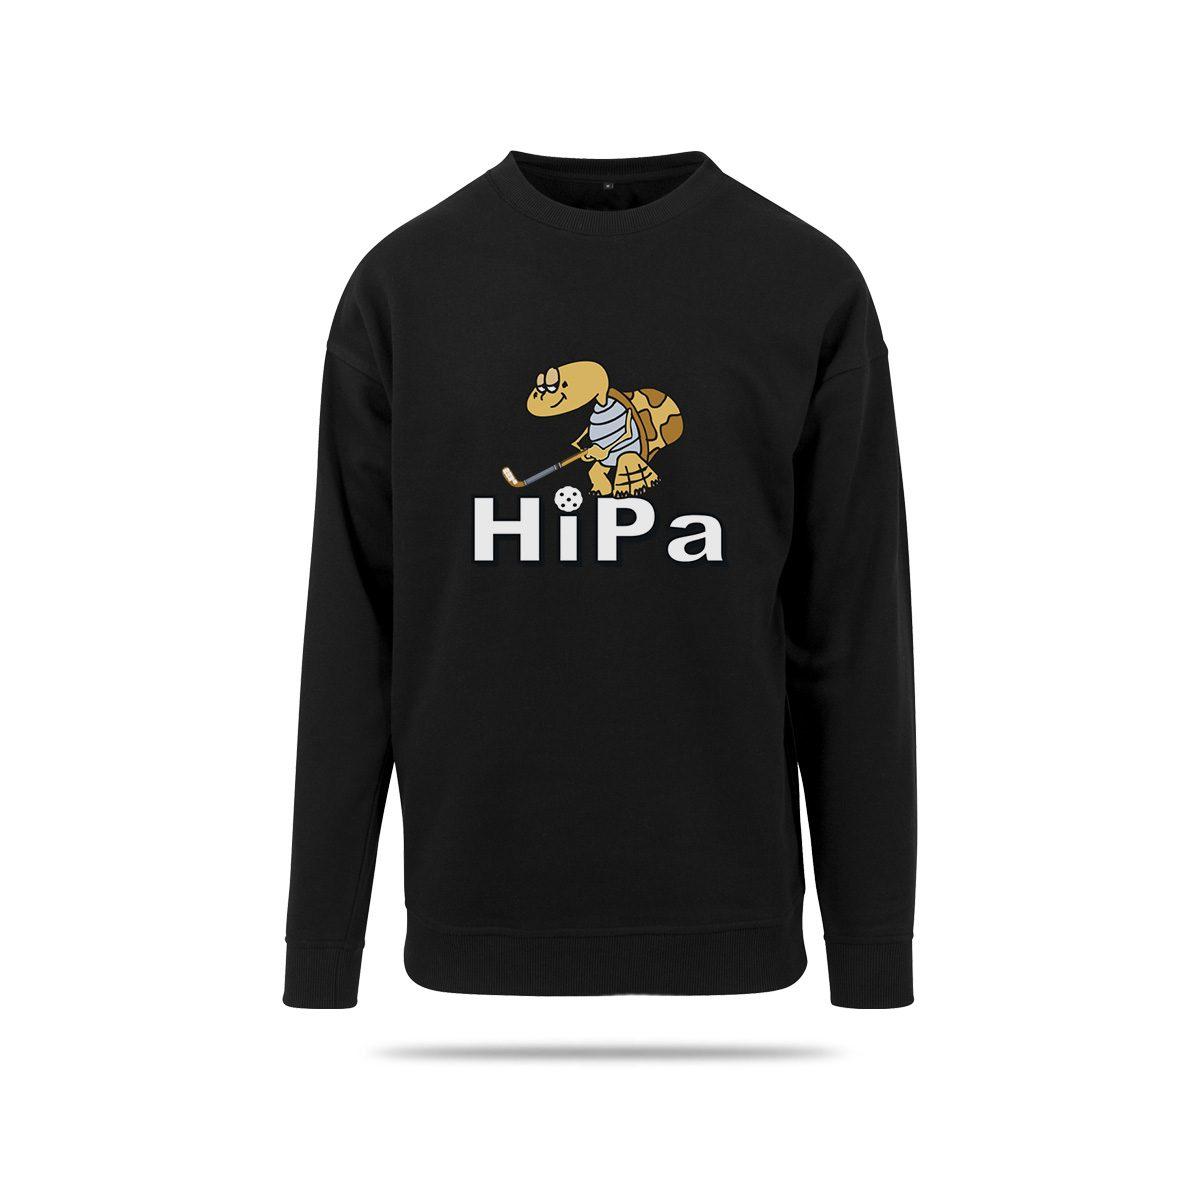 Hipa-6004-musta